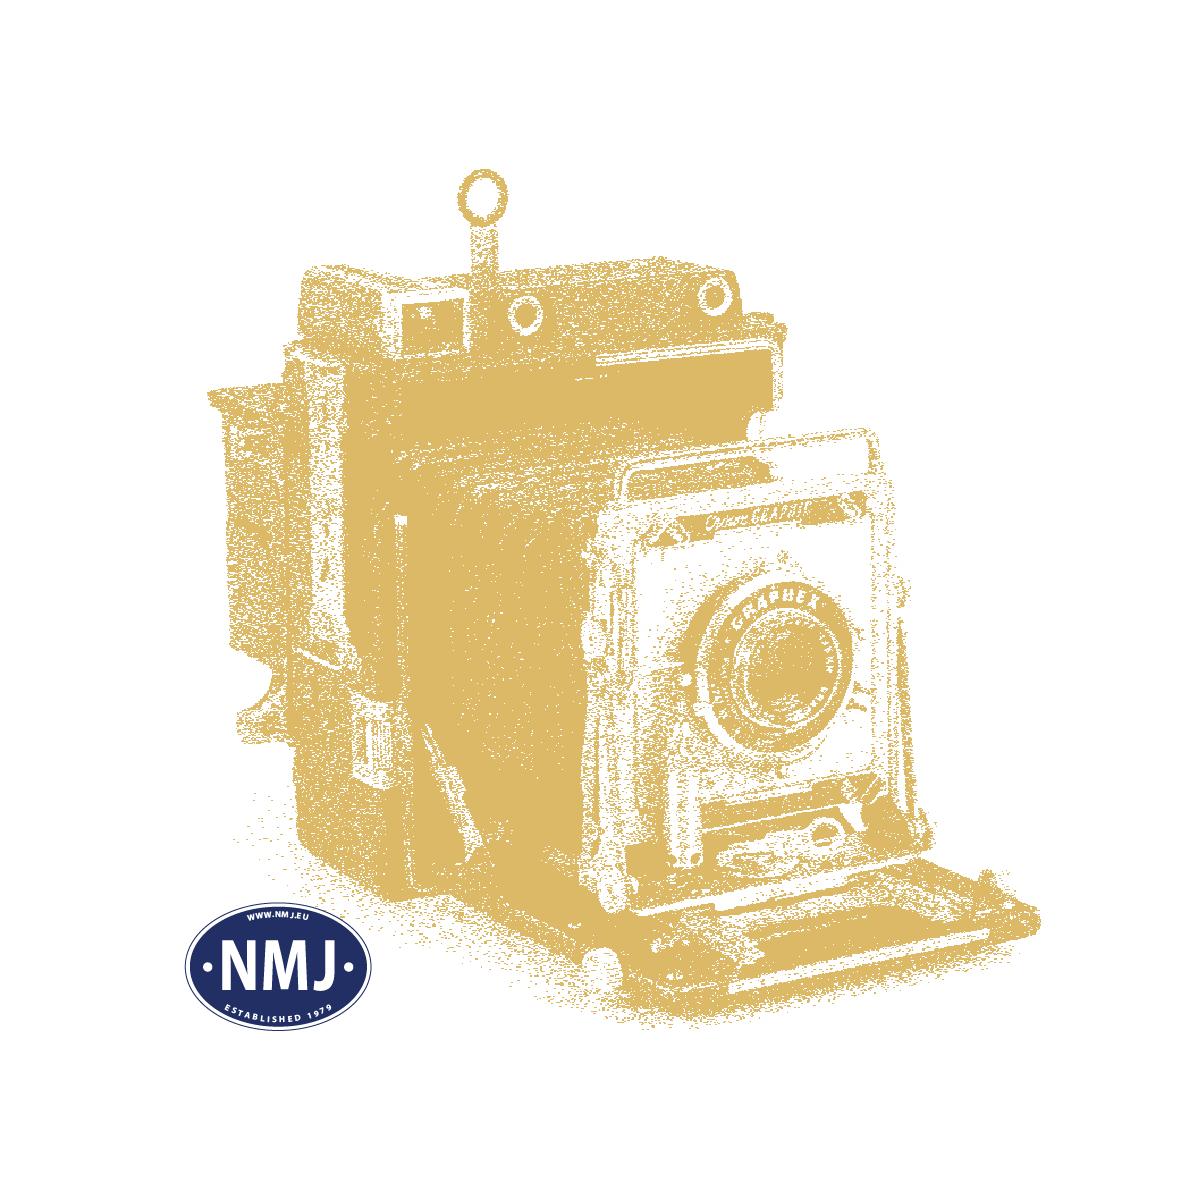 NMJT81.301 - NMJ Topline NSB BM73b, Red IC Regional design, DC